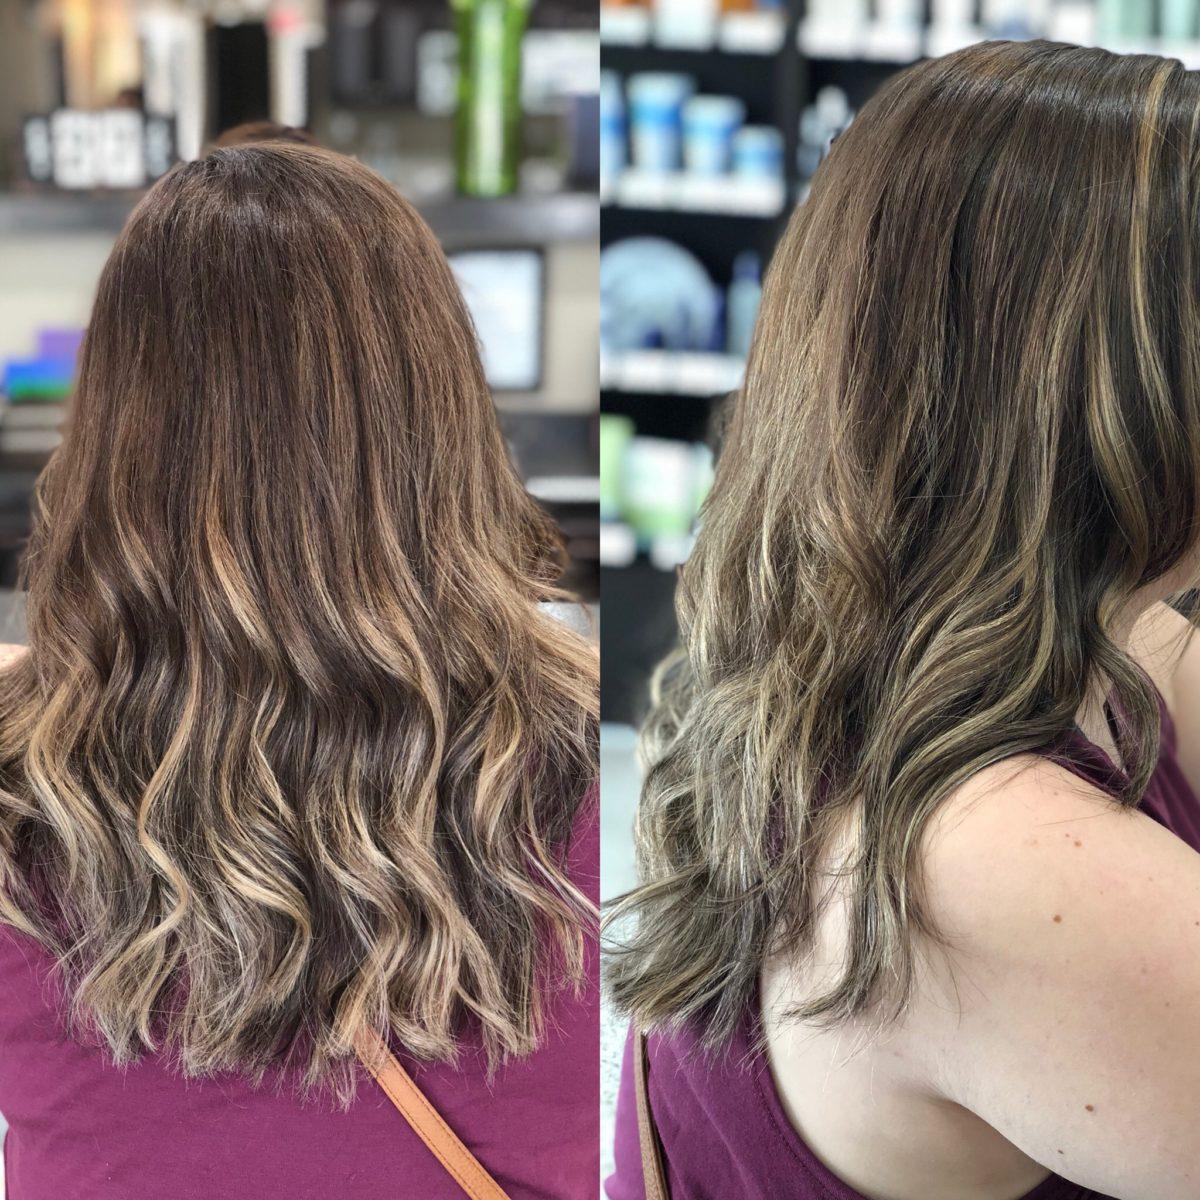 Hair Color & Cut Burlington, Wisconsin